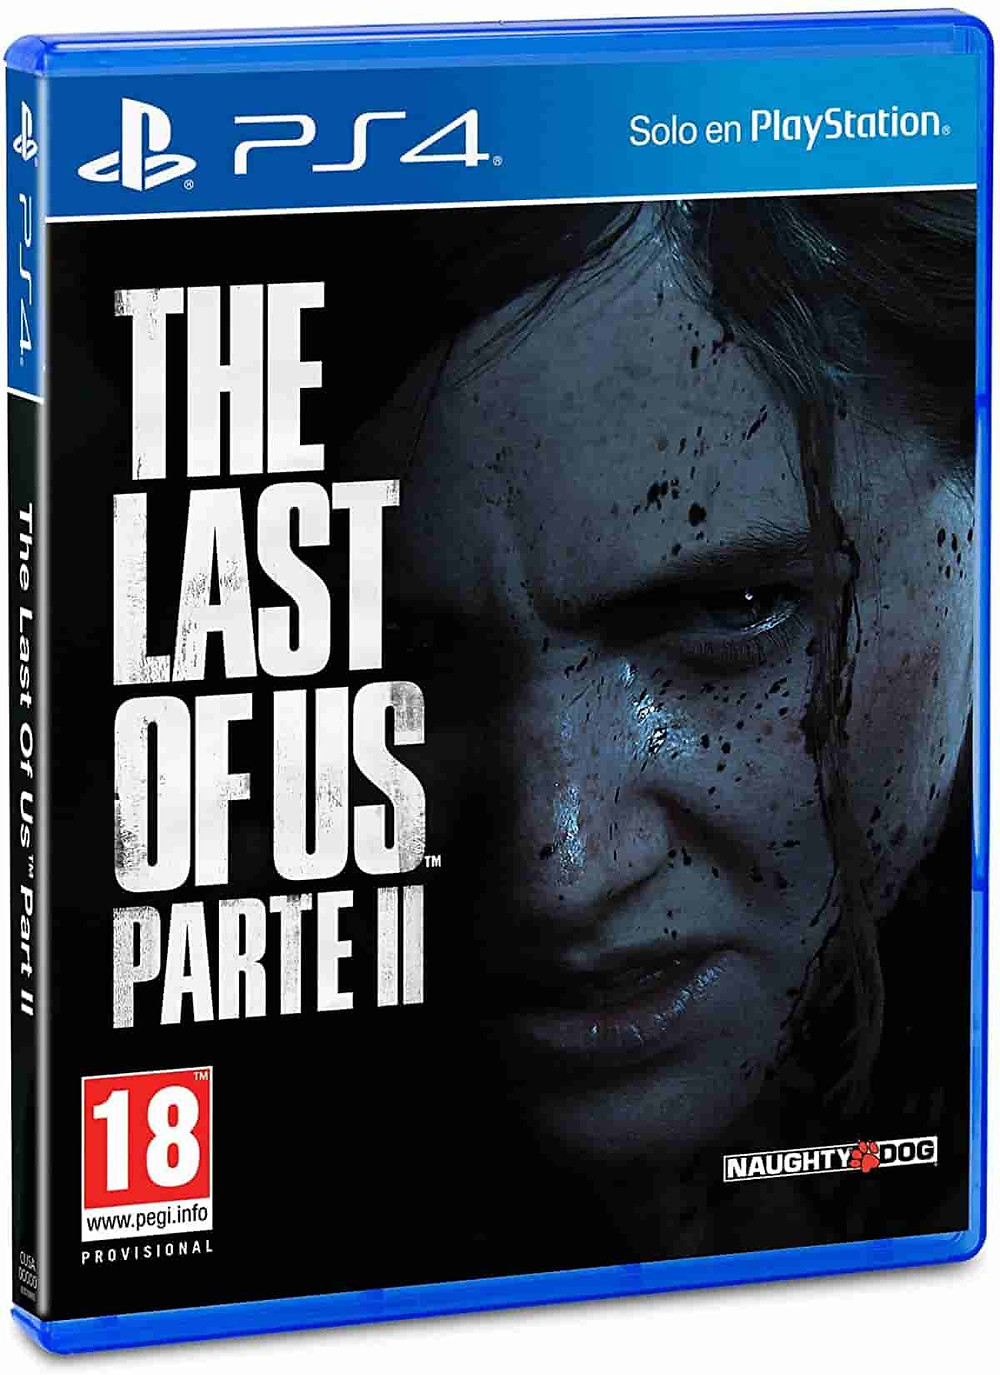 Juego imprescindible ps4: The Last of Us Parte II